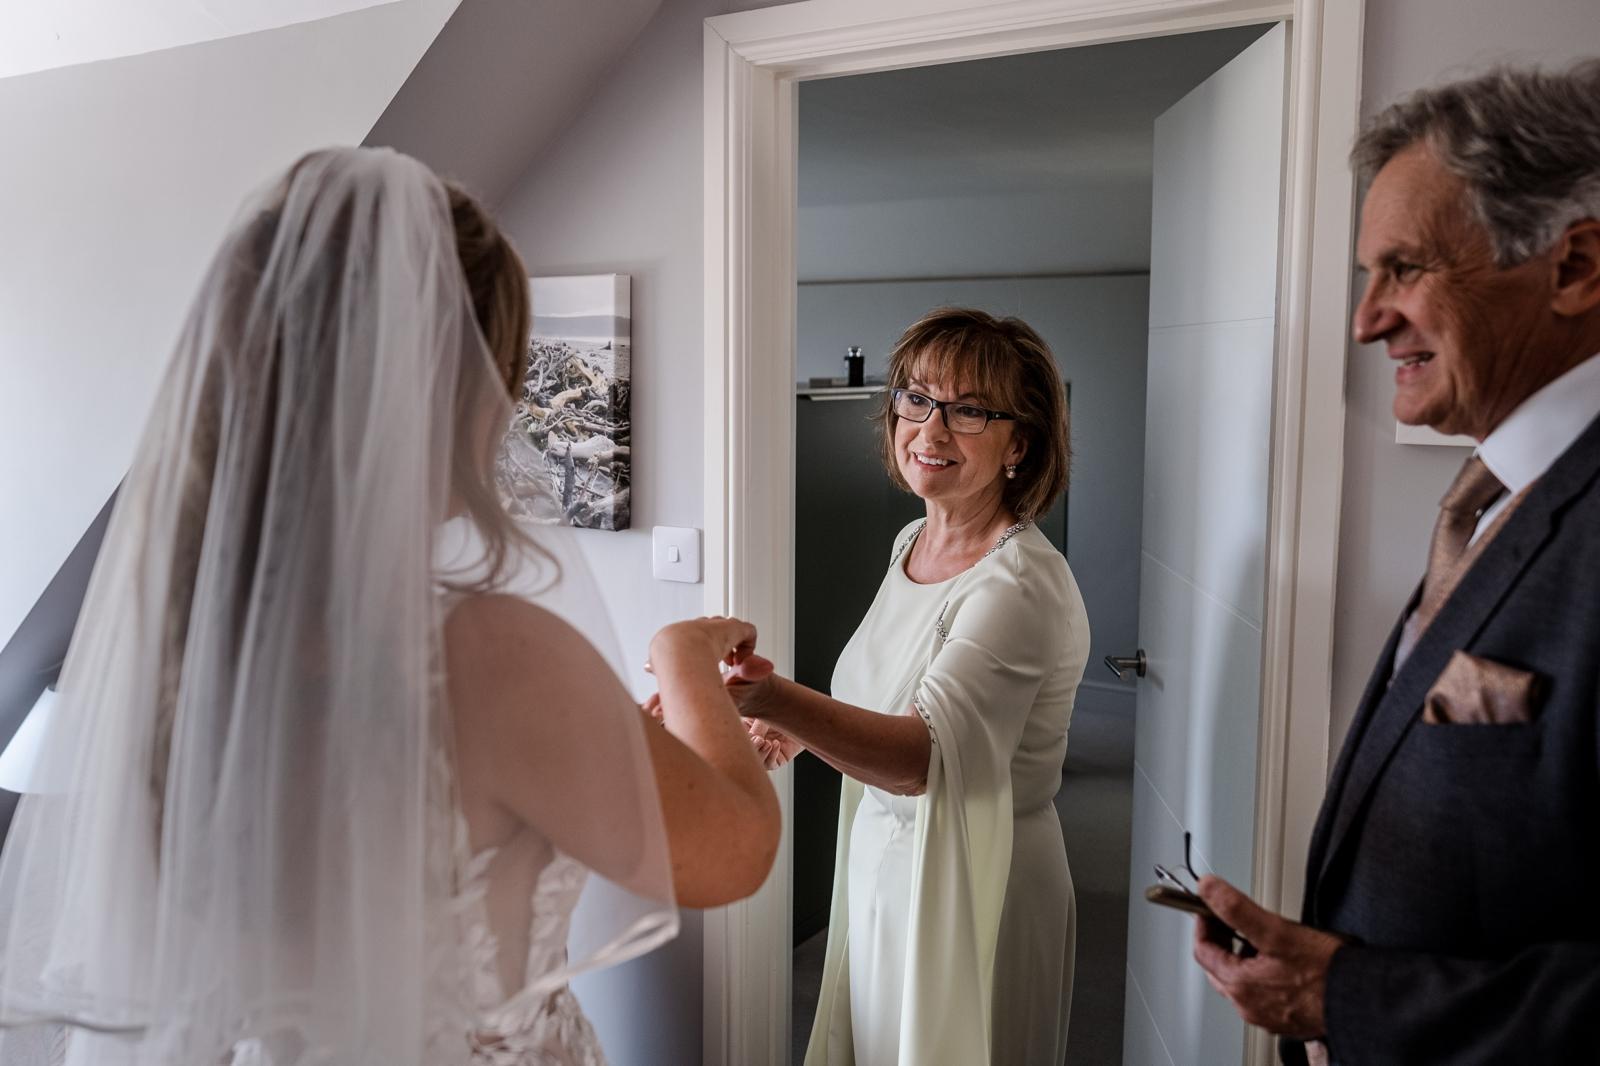 mum smiling at bride